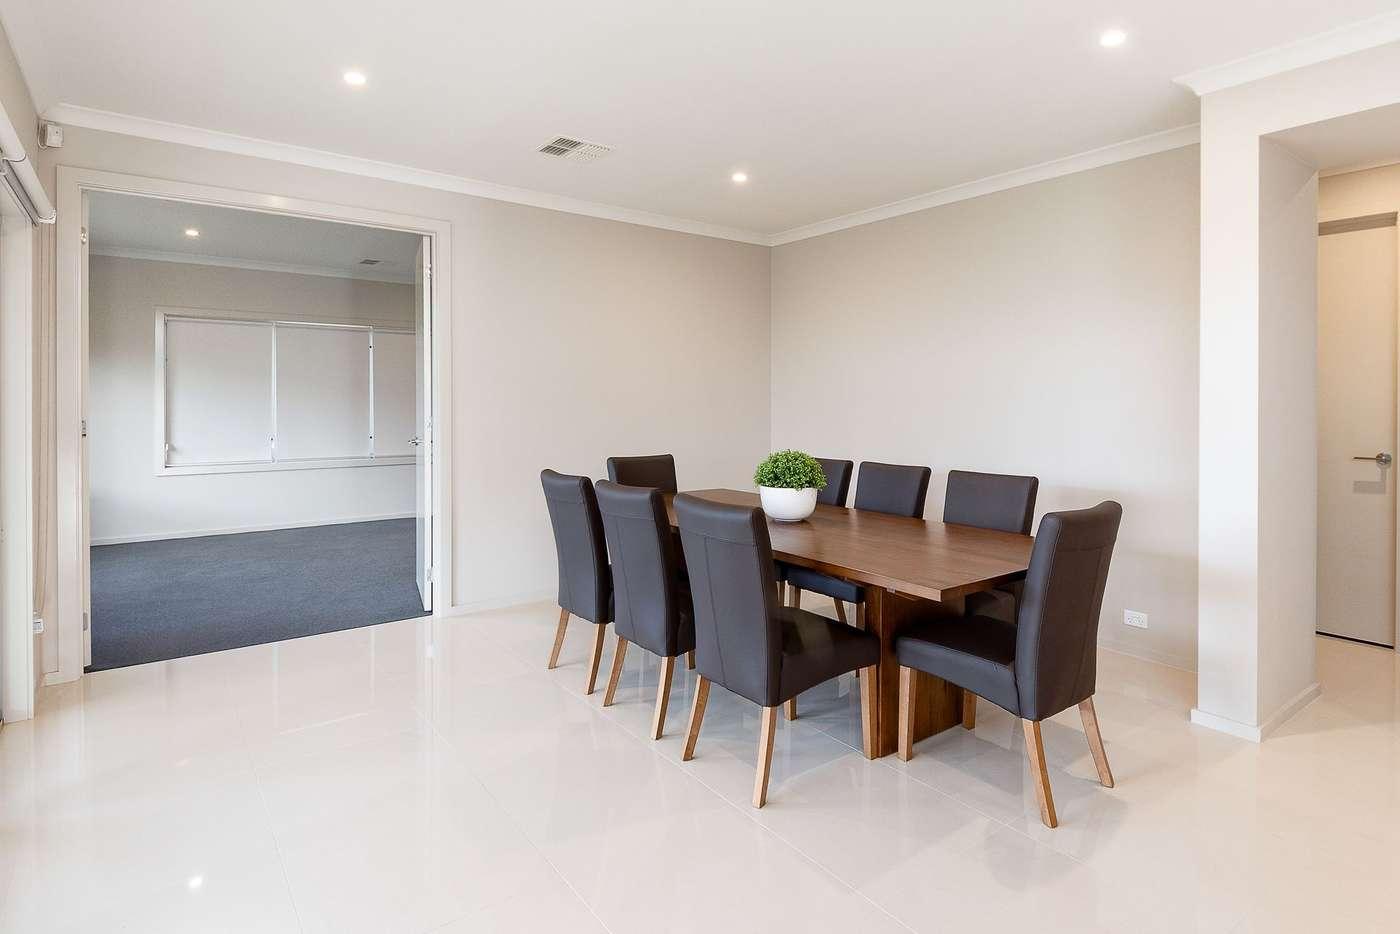 Sixth view of Homely house listing, 17 Seymour Drive, Mount Barker SA 5251